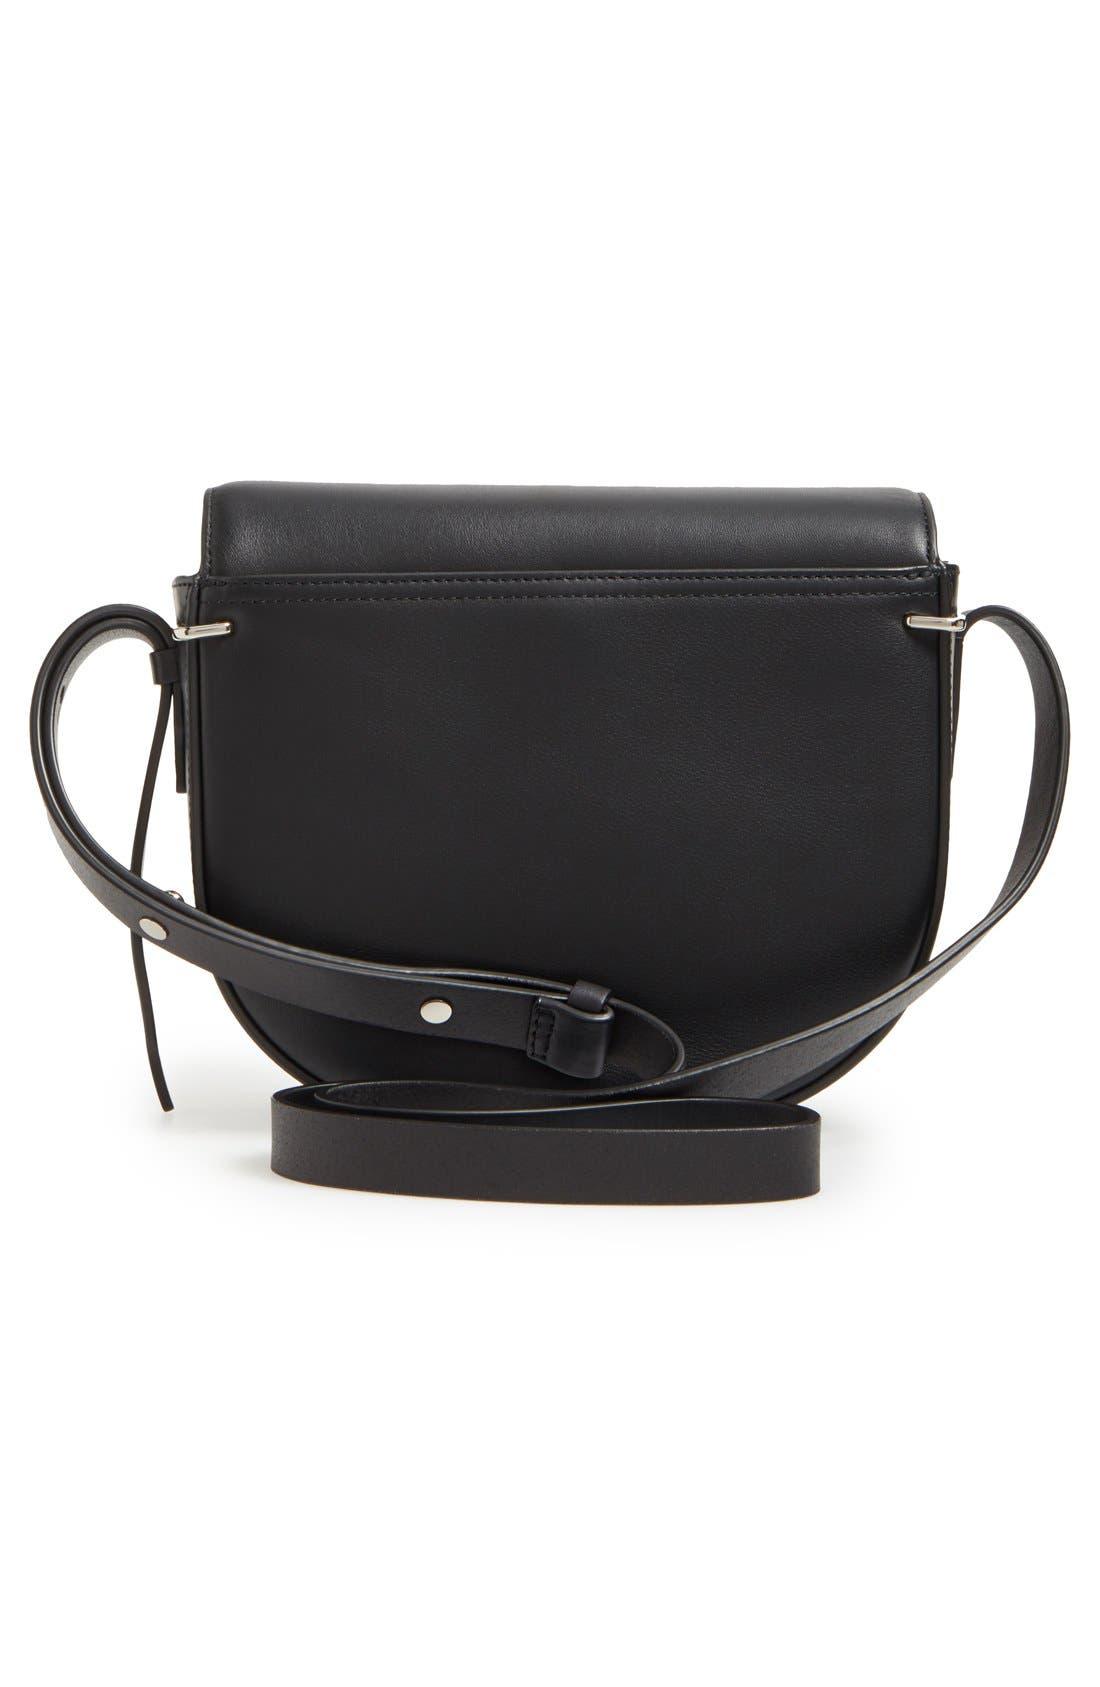 Alternate Image 3  - 3.1 Phillip Lim Alix Leather Saddle Bag